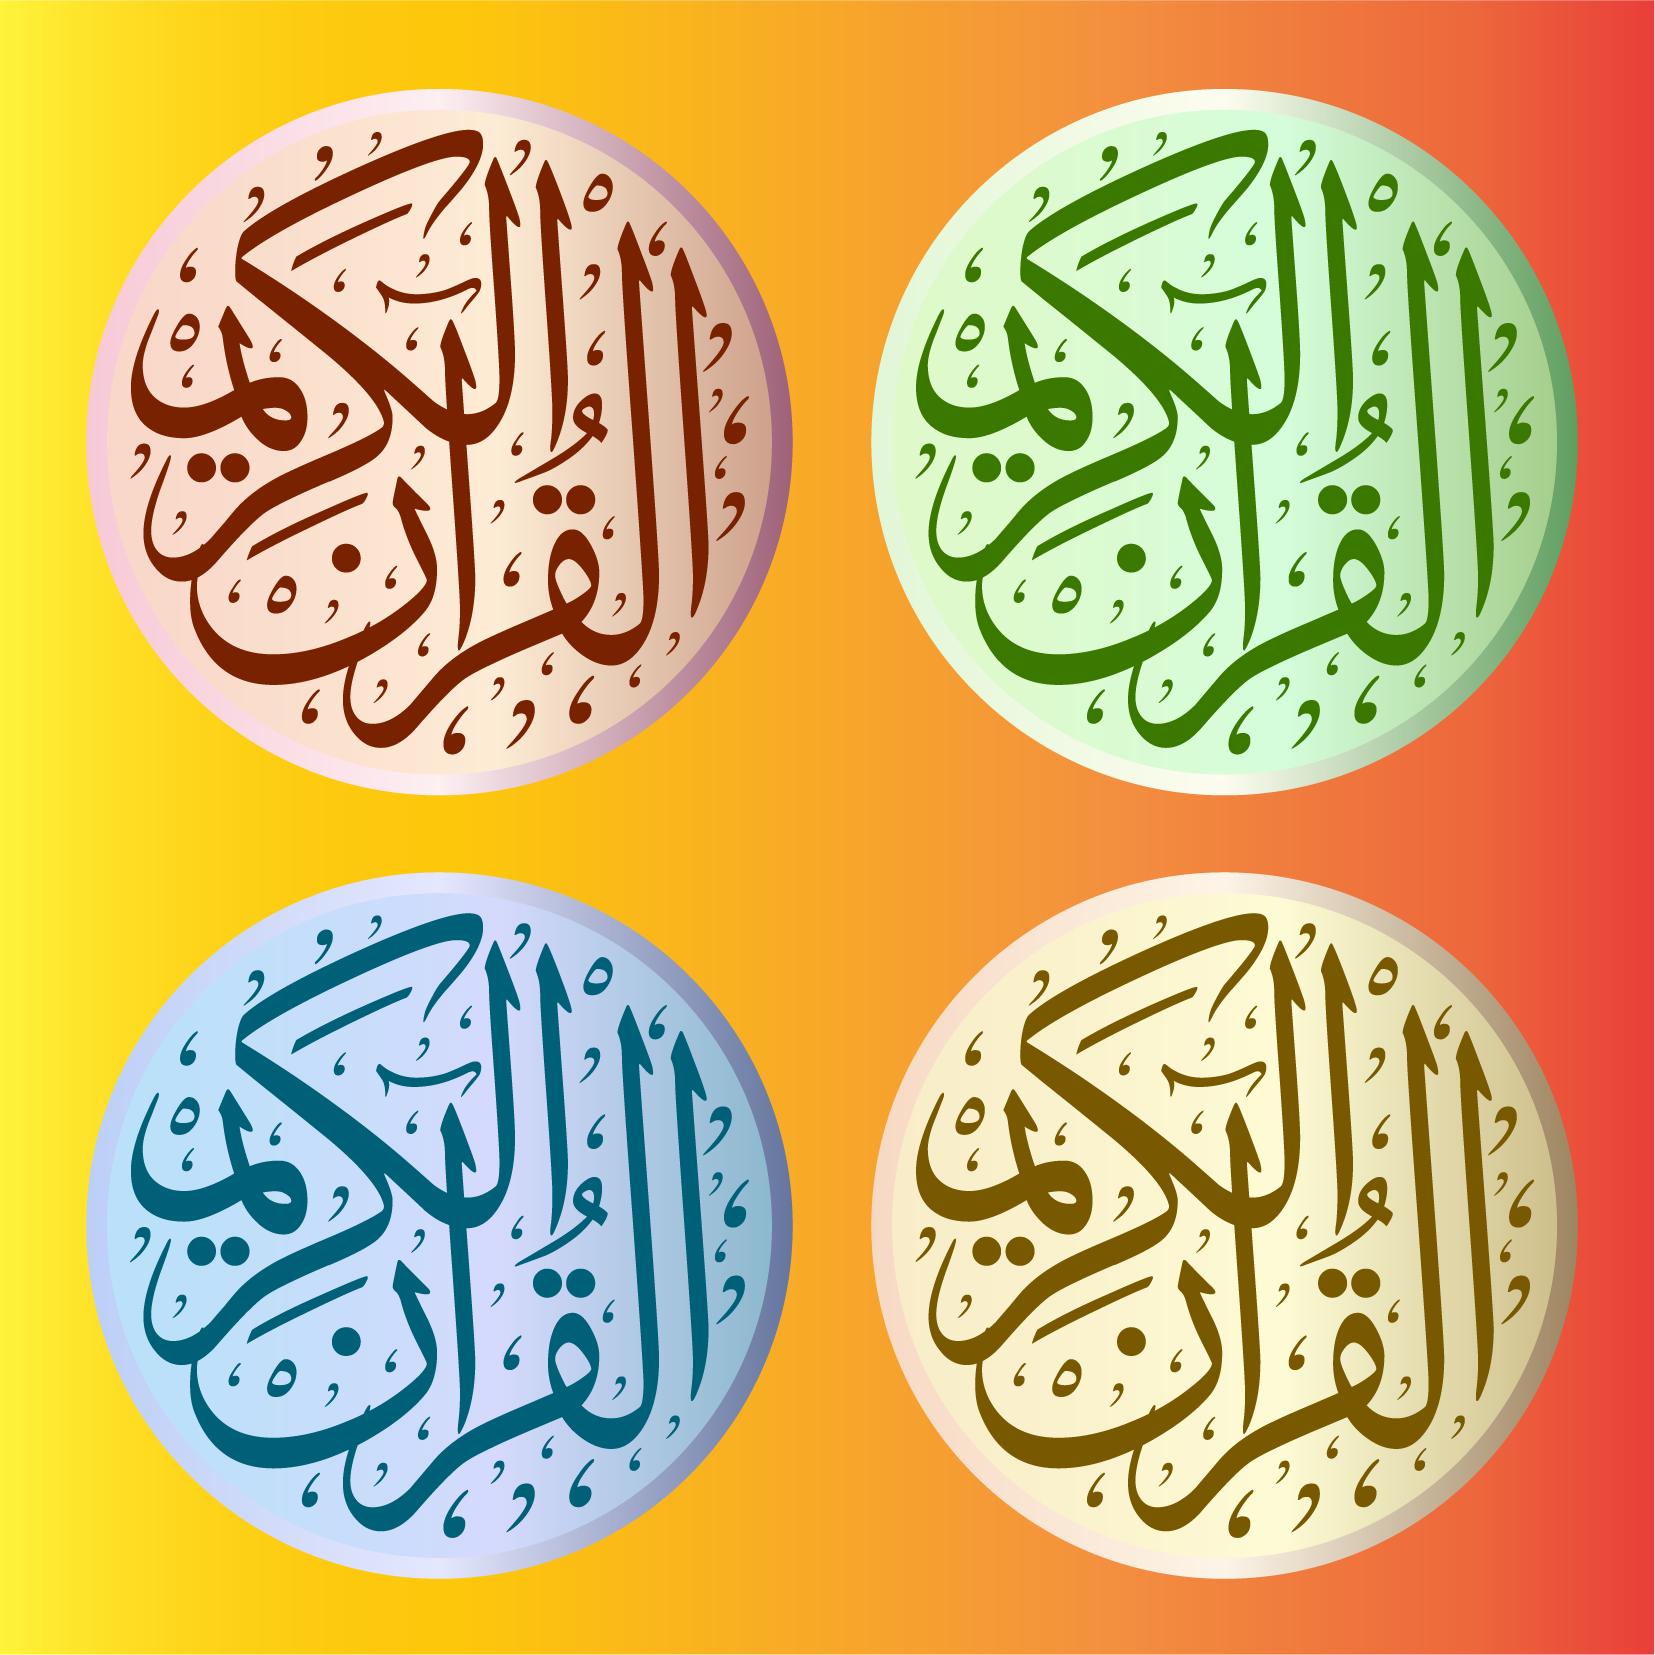 quran logo arabic islamic svg eps psd ai pdf png vector download free #islamic #islam #arab #logos #logo #arabic #vector #vectors  #Quran #logos #font #logo #design #fonts